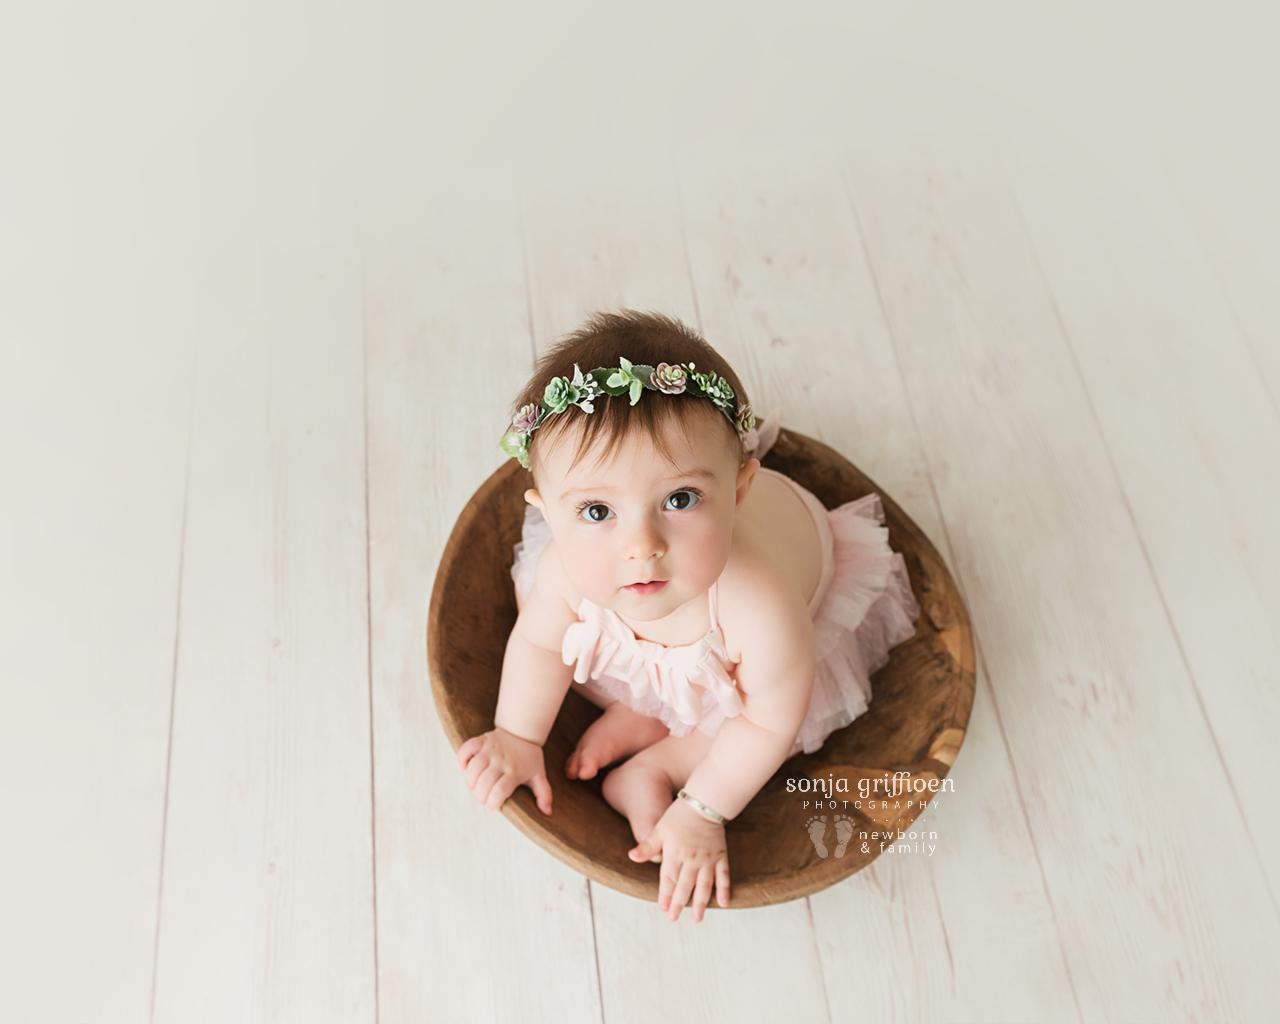 Annabella-Milestone-Brisbane-Baby-Photographer-Sonja-Griffioen-02.jpg